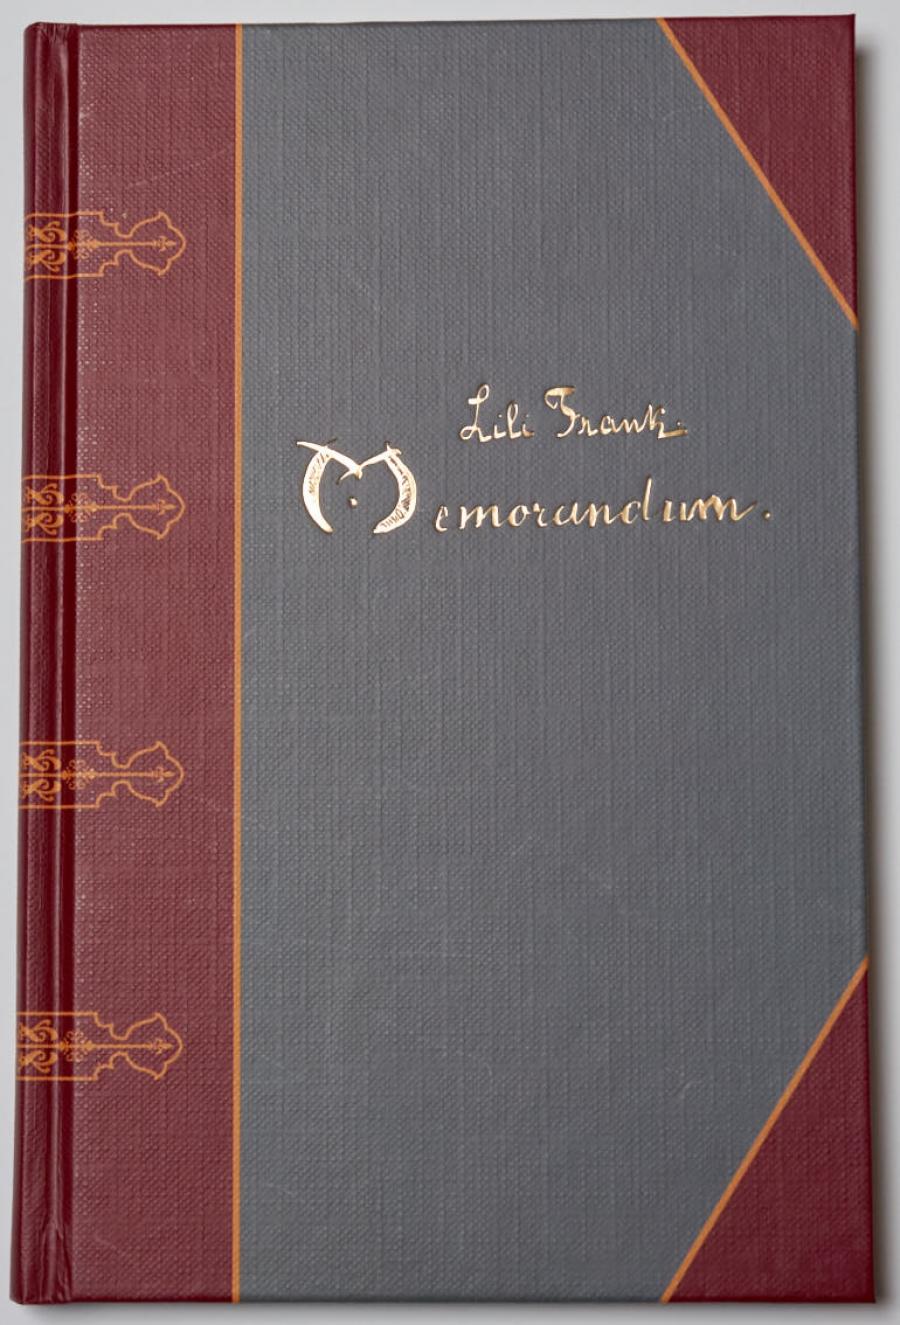 Lili Frank:Memorandum. Ein Poesiealbum 1909-1929